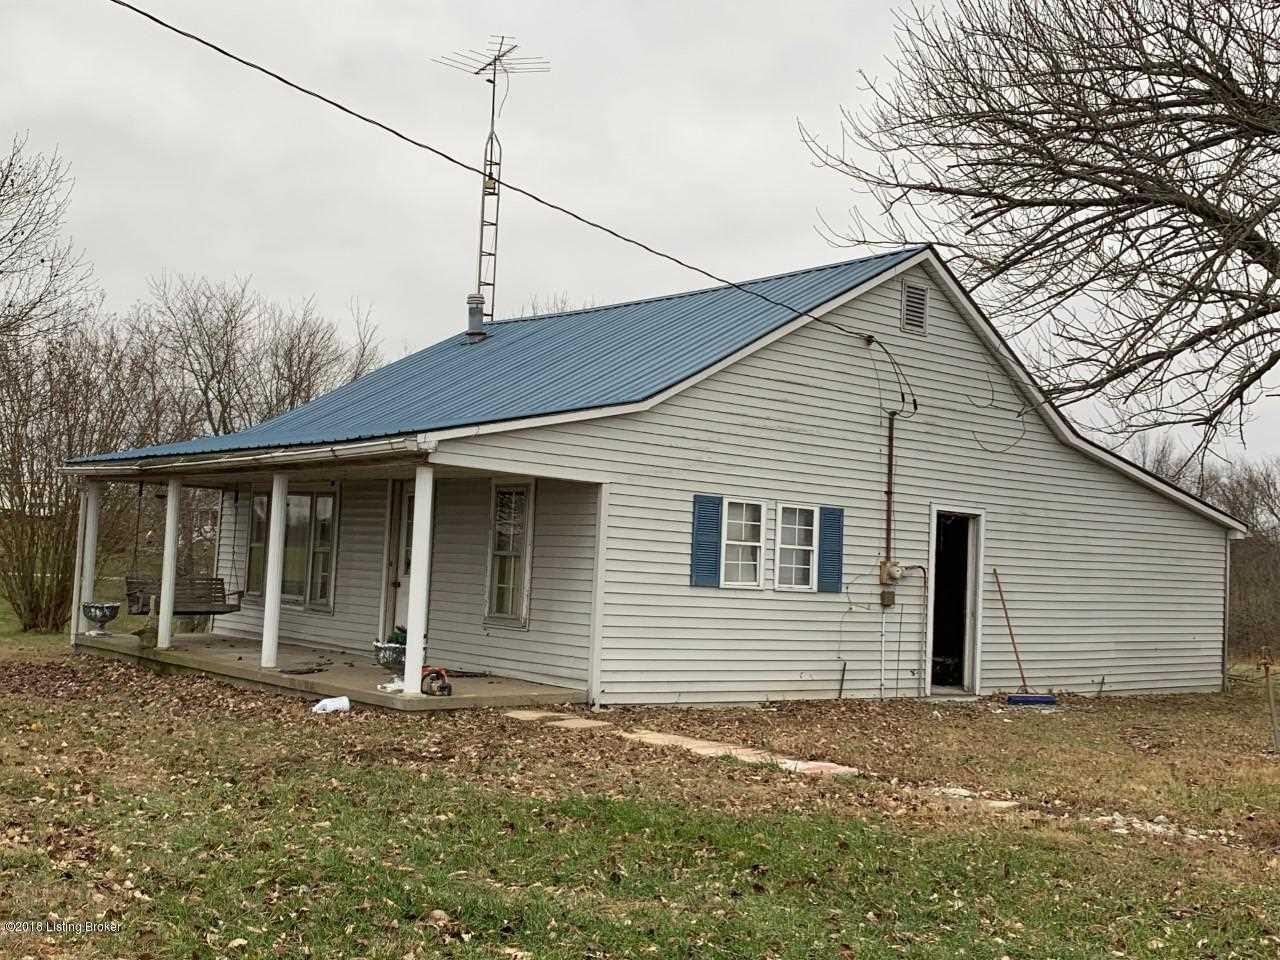 10265 Anneta Rd Leitchfield, KY 42754 | MLS 1520430 Photo 1